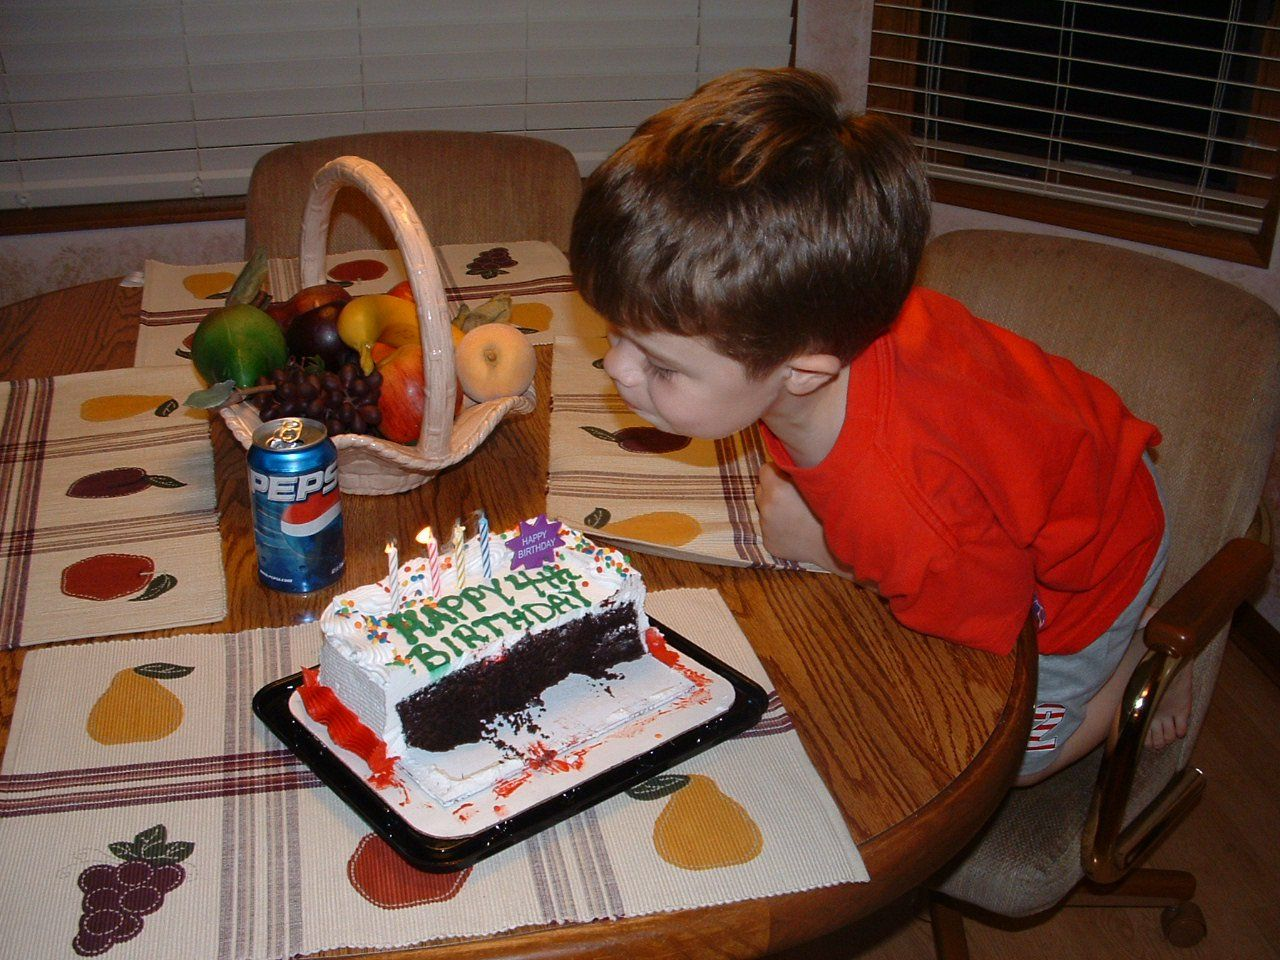 Happy birthday Dylan!